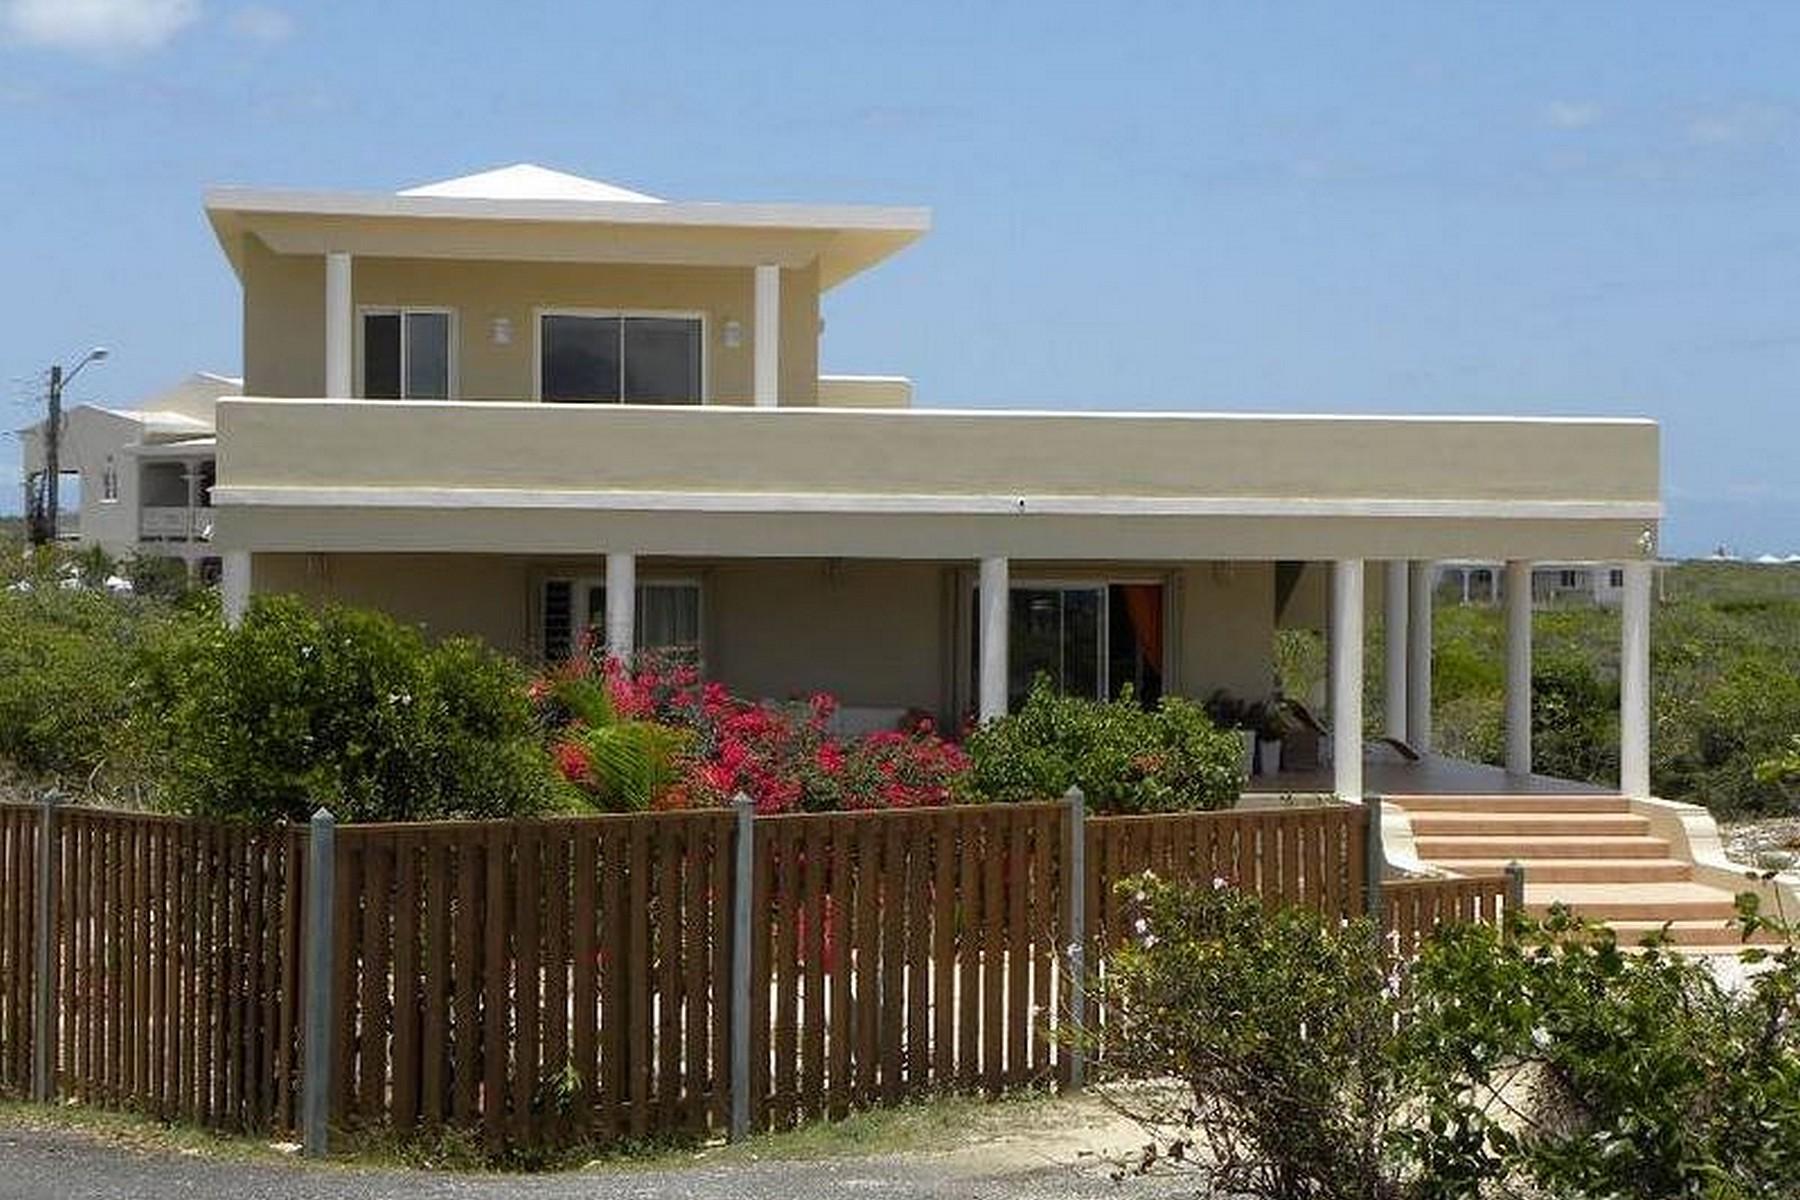 Single Family Home for Sale at Berg's Beauty Sea Feathers Sea Feathers, AI 2640 Anguilla